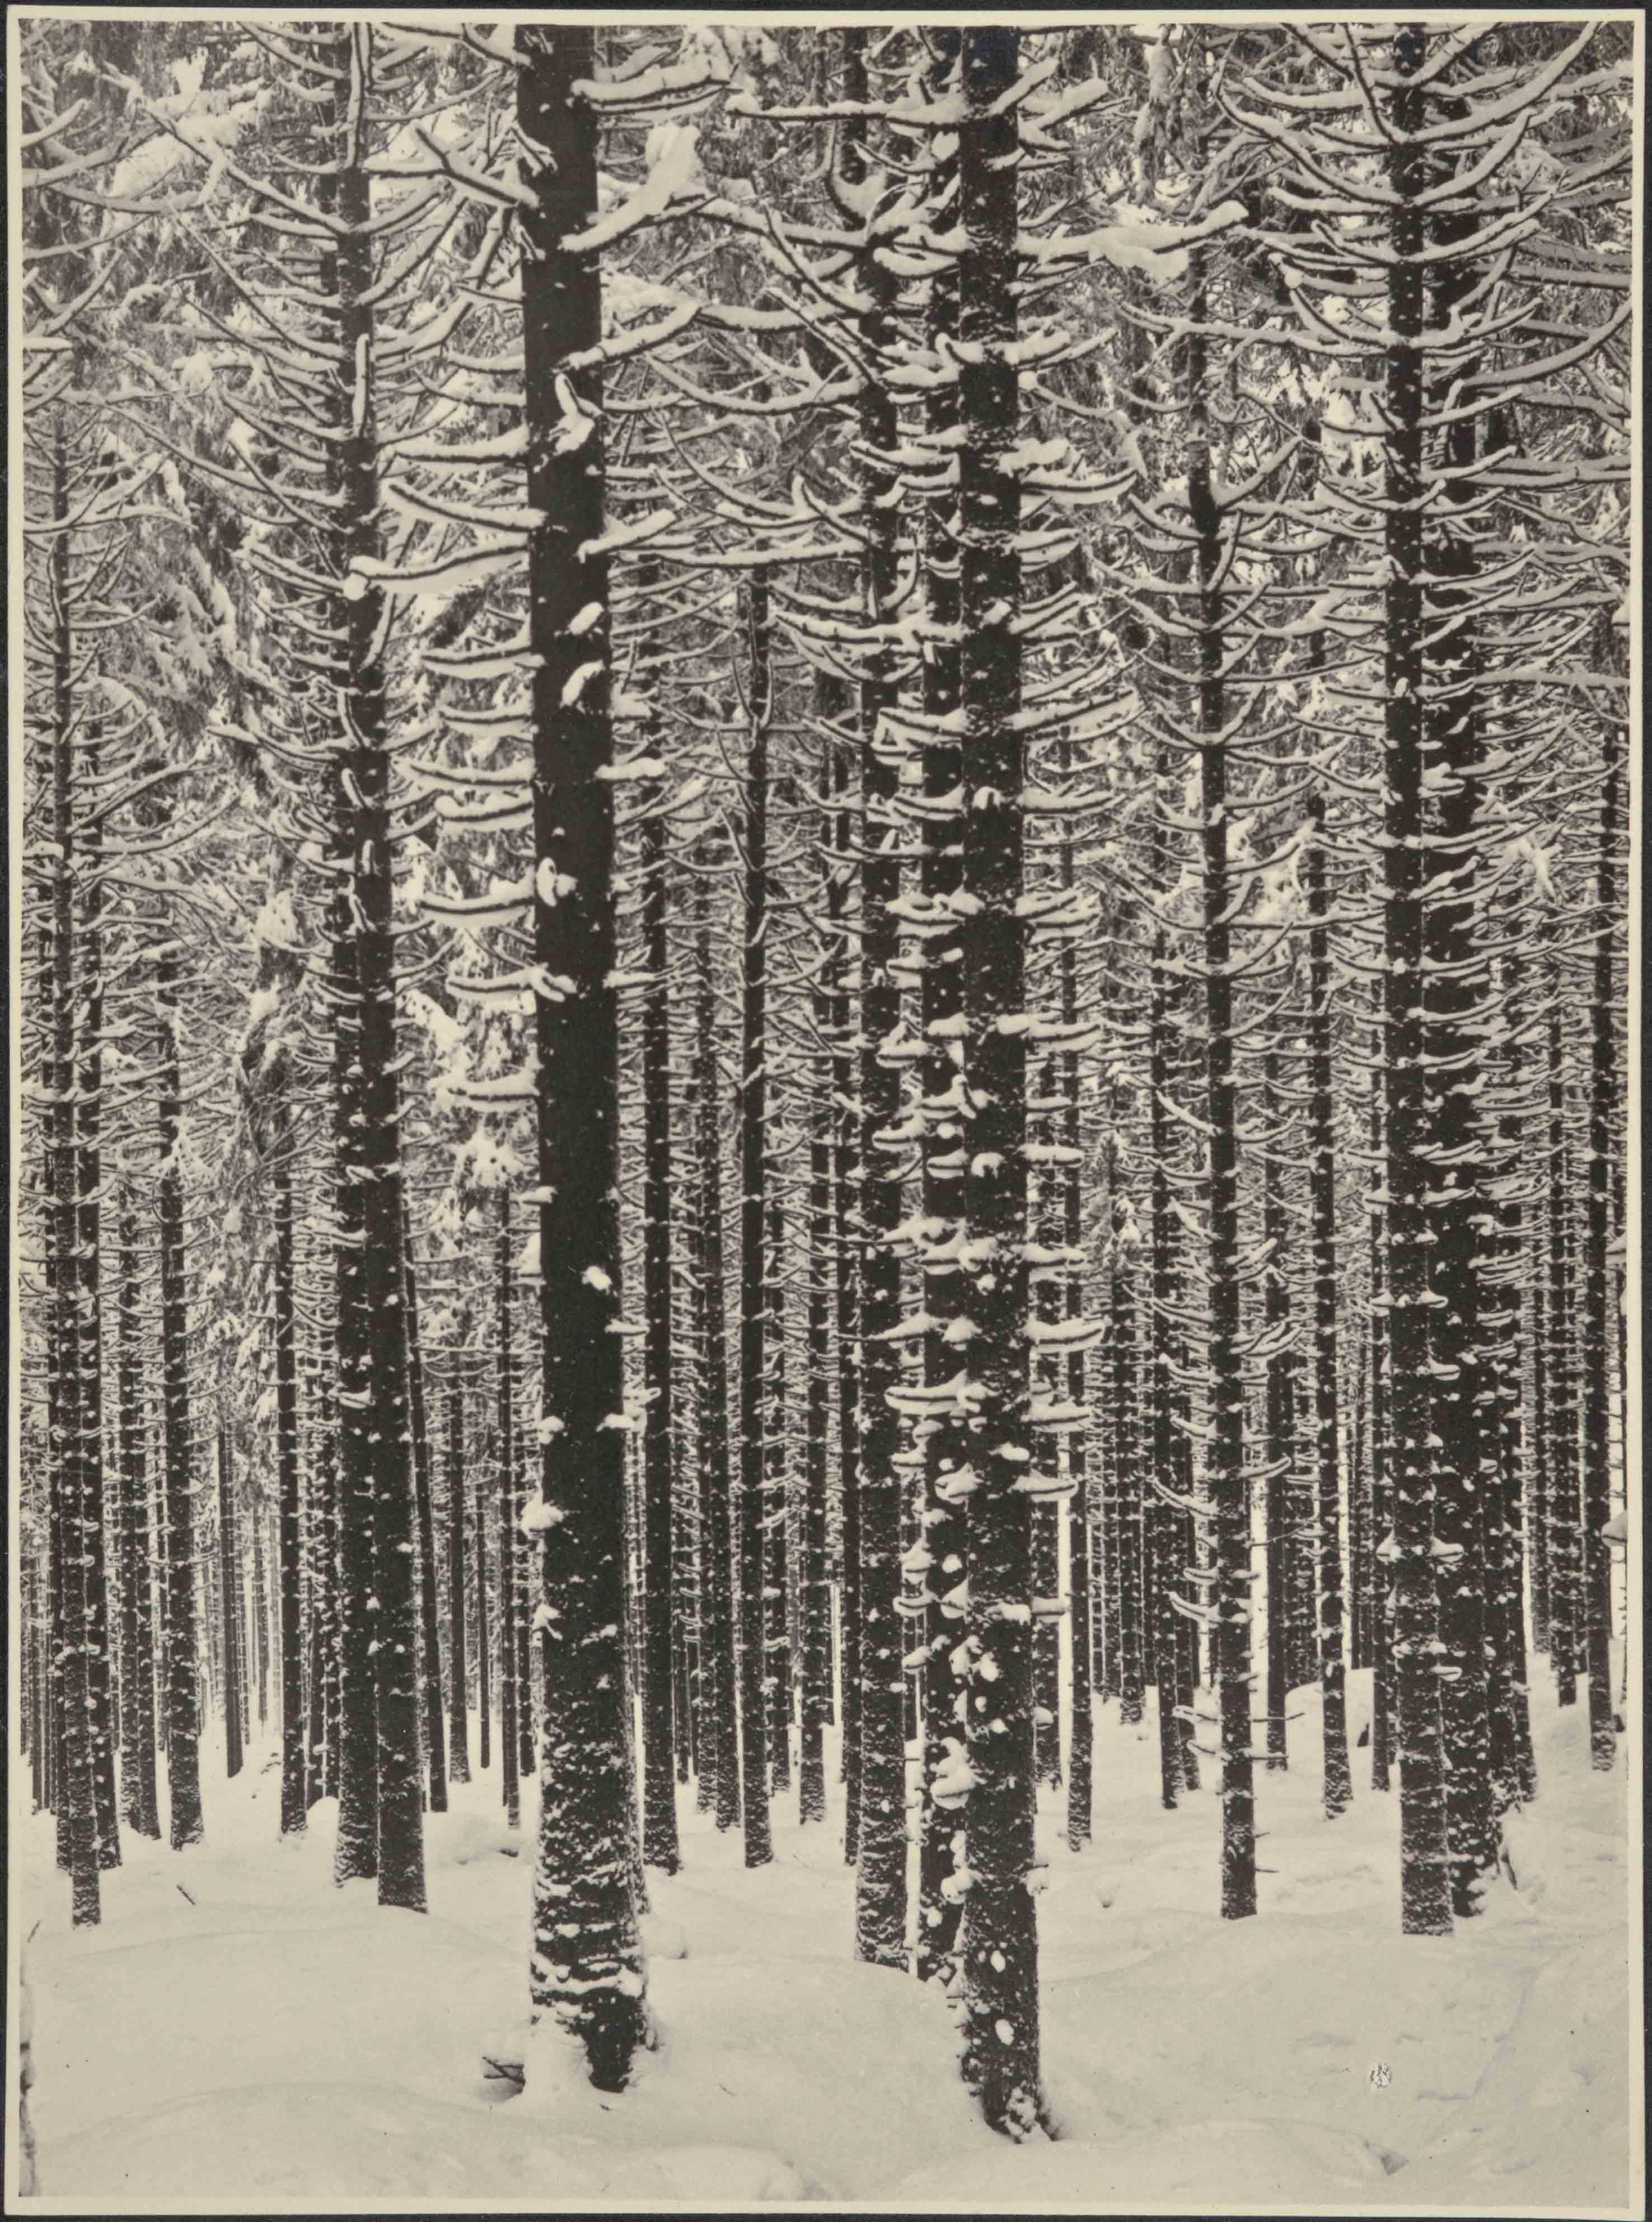 ALBERT RENGER-PATZSCH — Gebirgsforst im Winter (Fichtenwald im Winter) [Forêt de montagne en hiver (forêt de sapins en hiver)], 1926 Galerie Berinson, Berlin © Albert Renger-Patzsch / Archiv Ann und Jürgen Wilde, Zülpich / ADAGP, Paris 2017